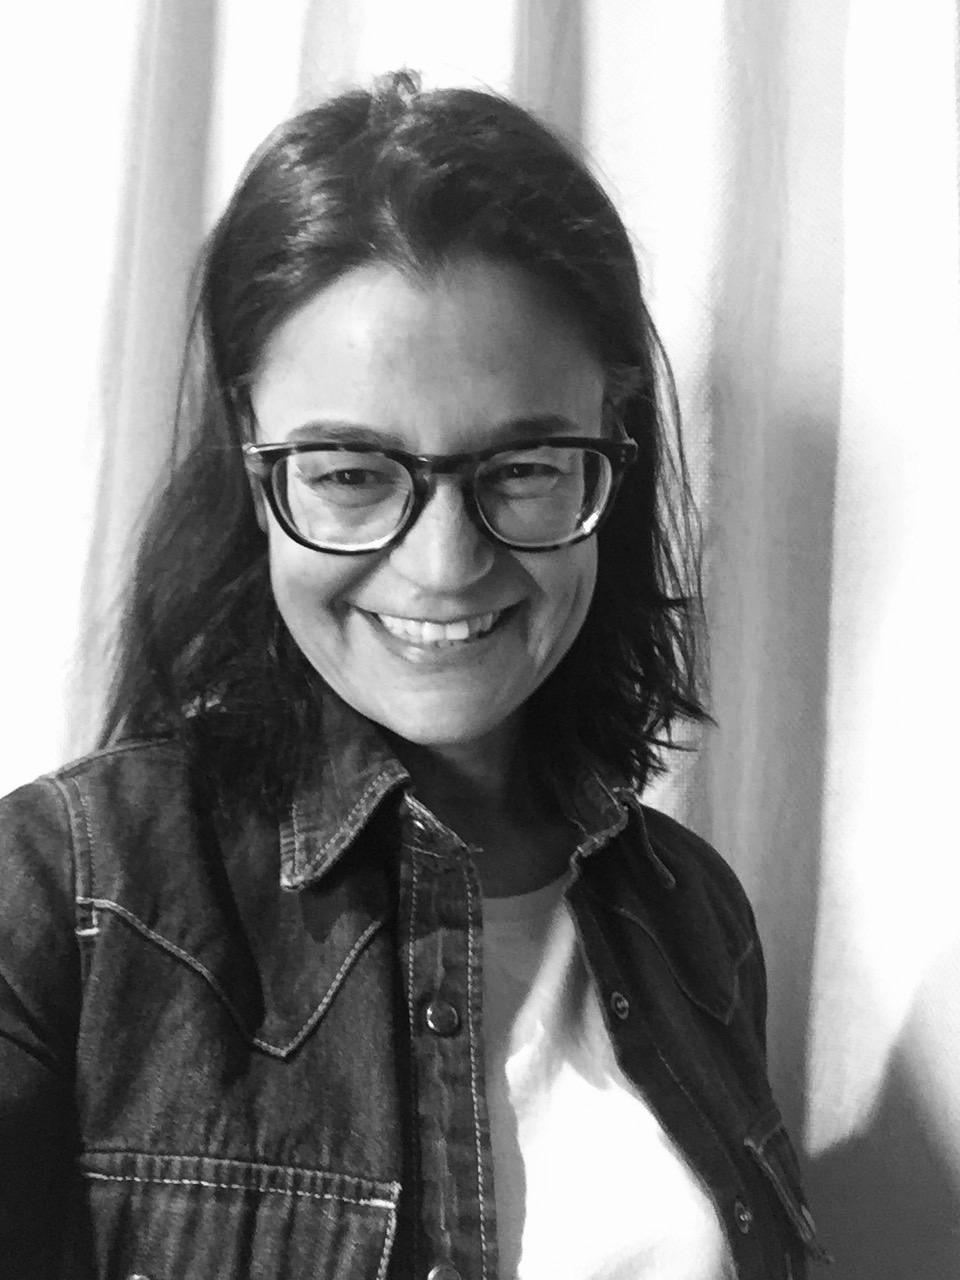 Daniela Selis